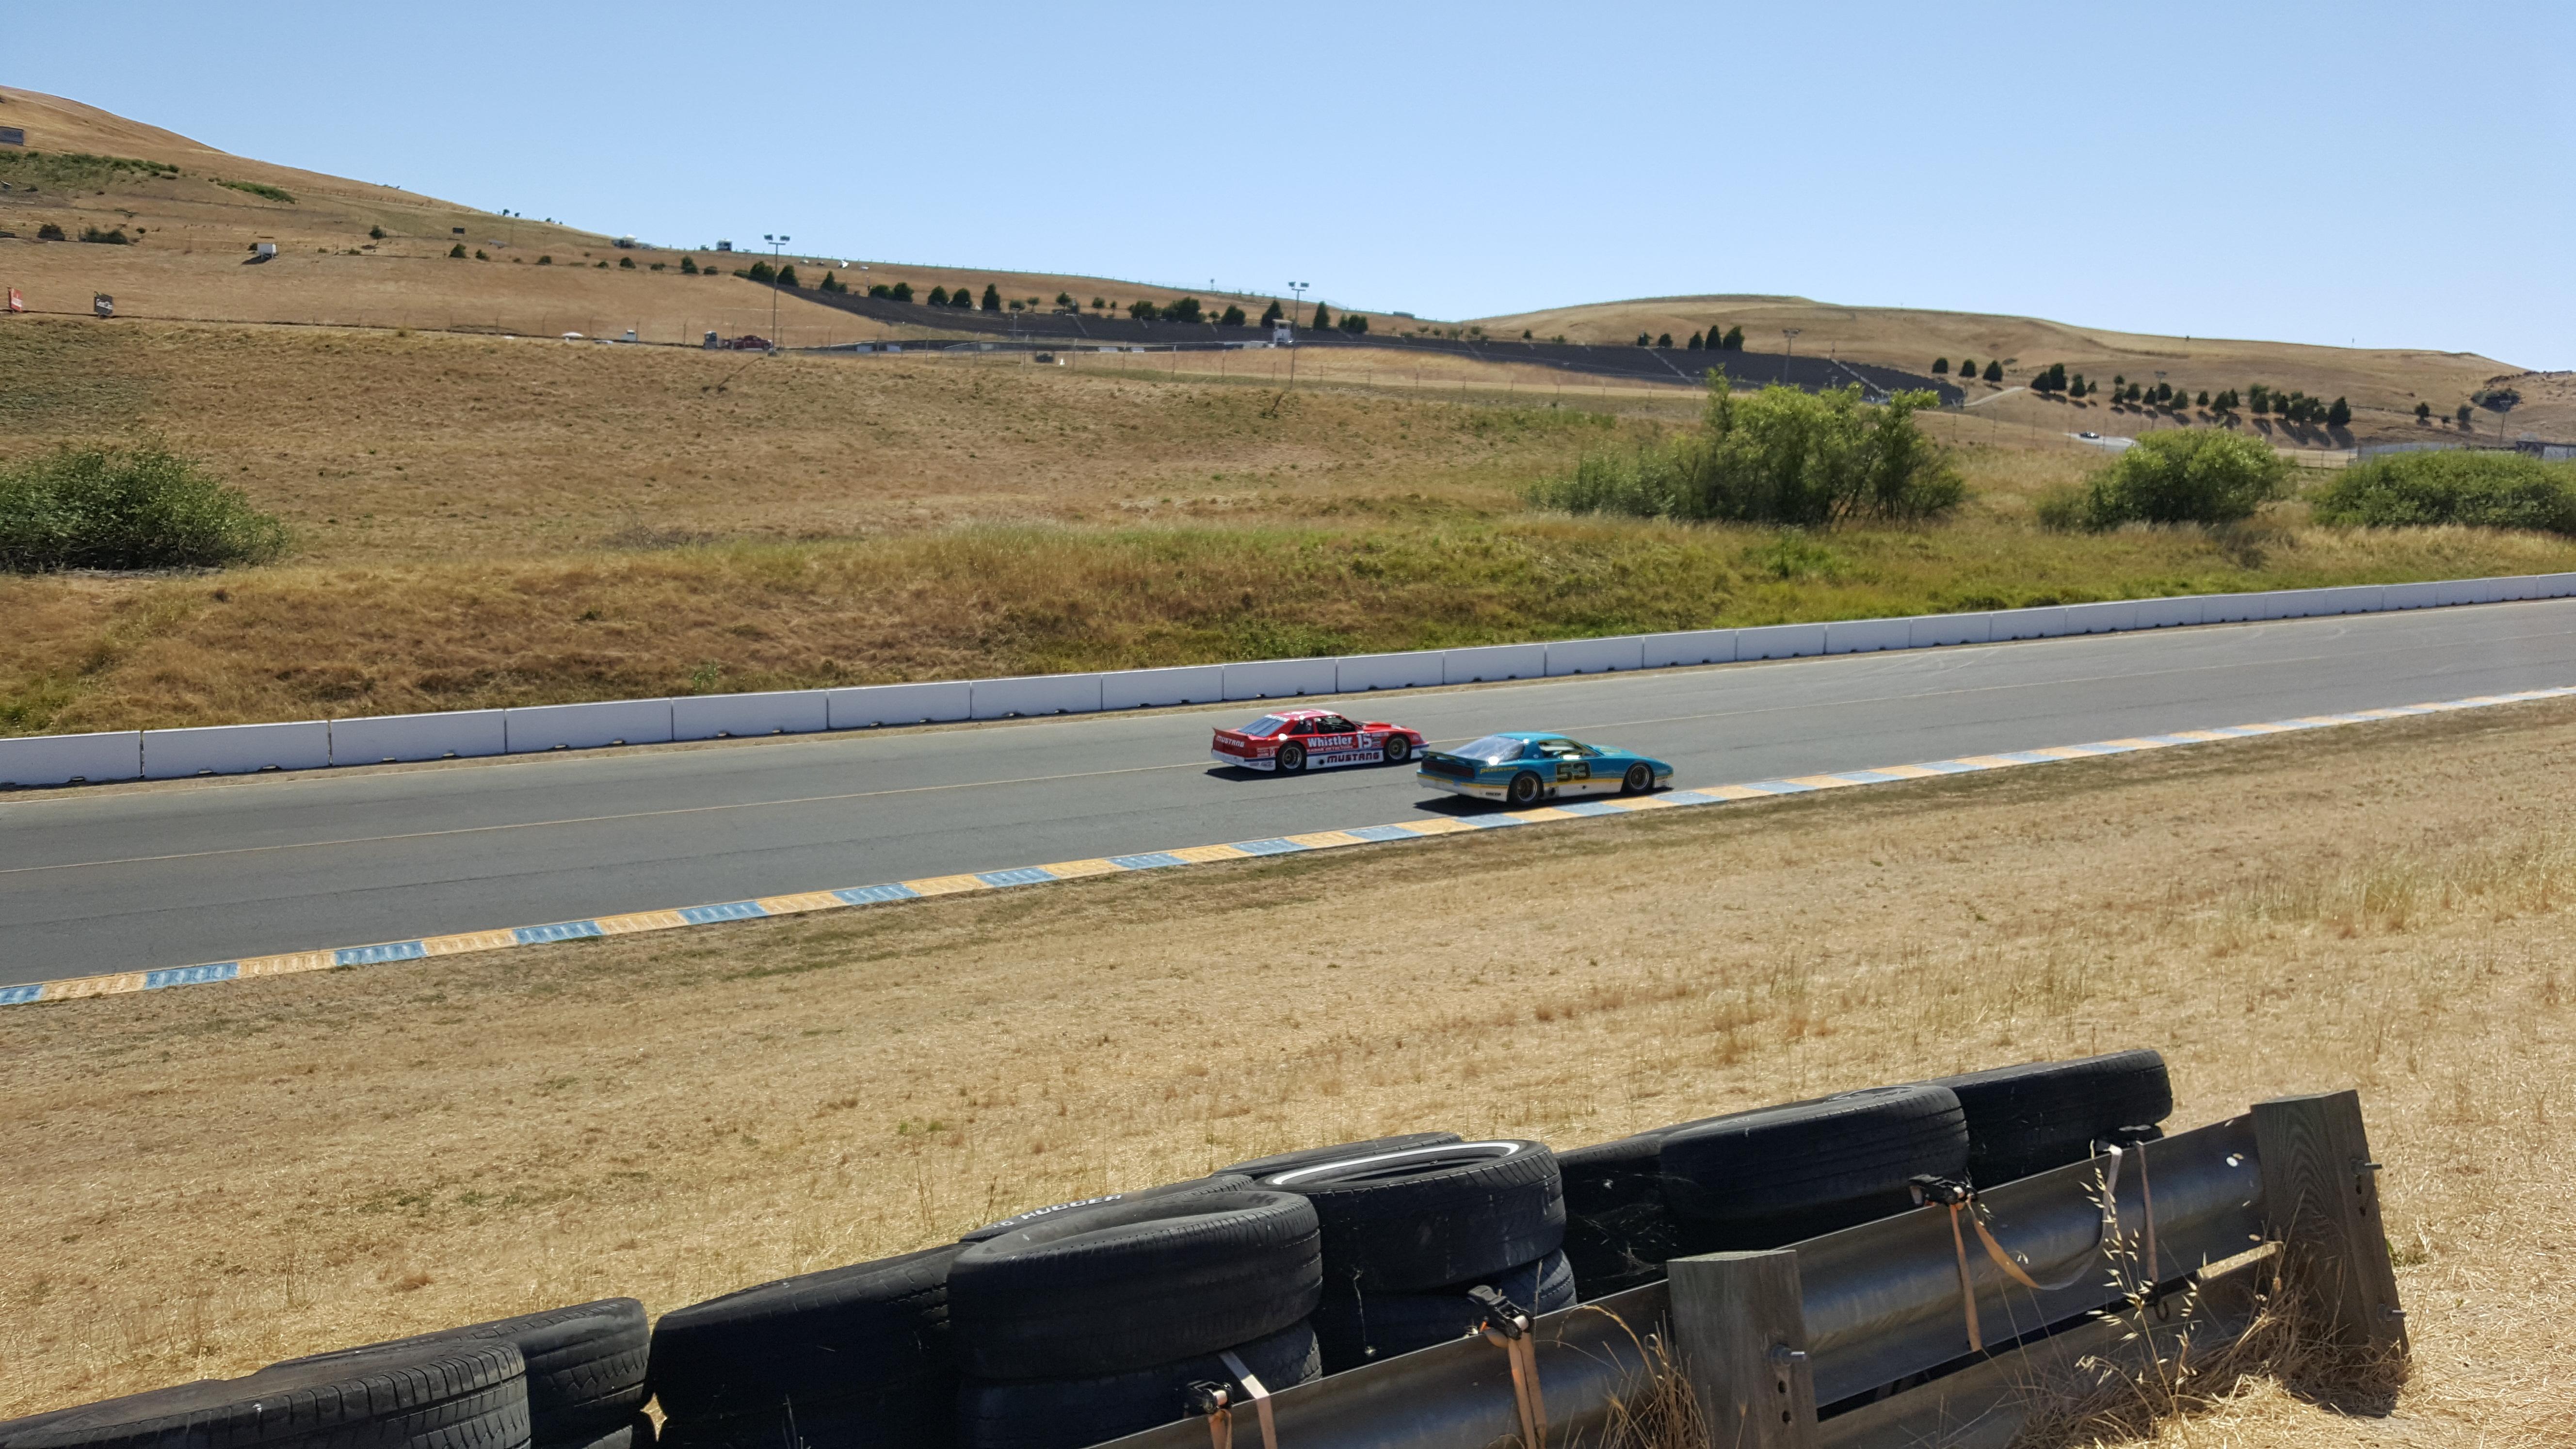 1982 -1991 HISTORIC IMSA GTO / SCCA TRANS AM RACING CARS AT THE 2016 ...